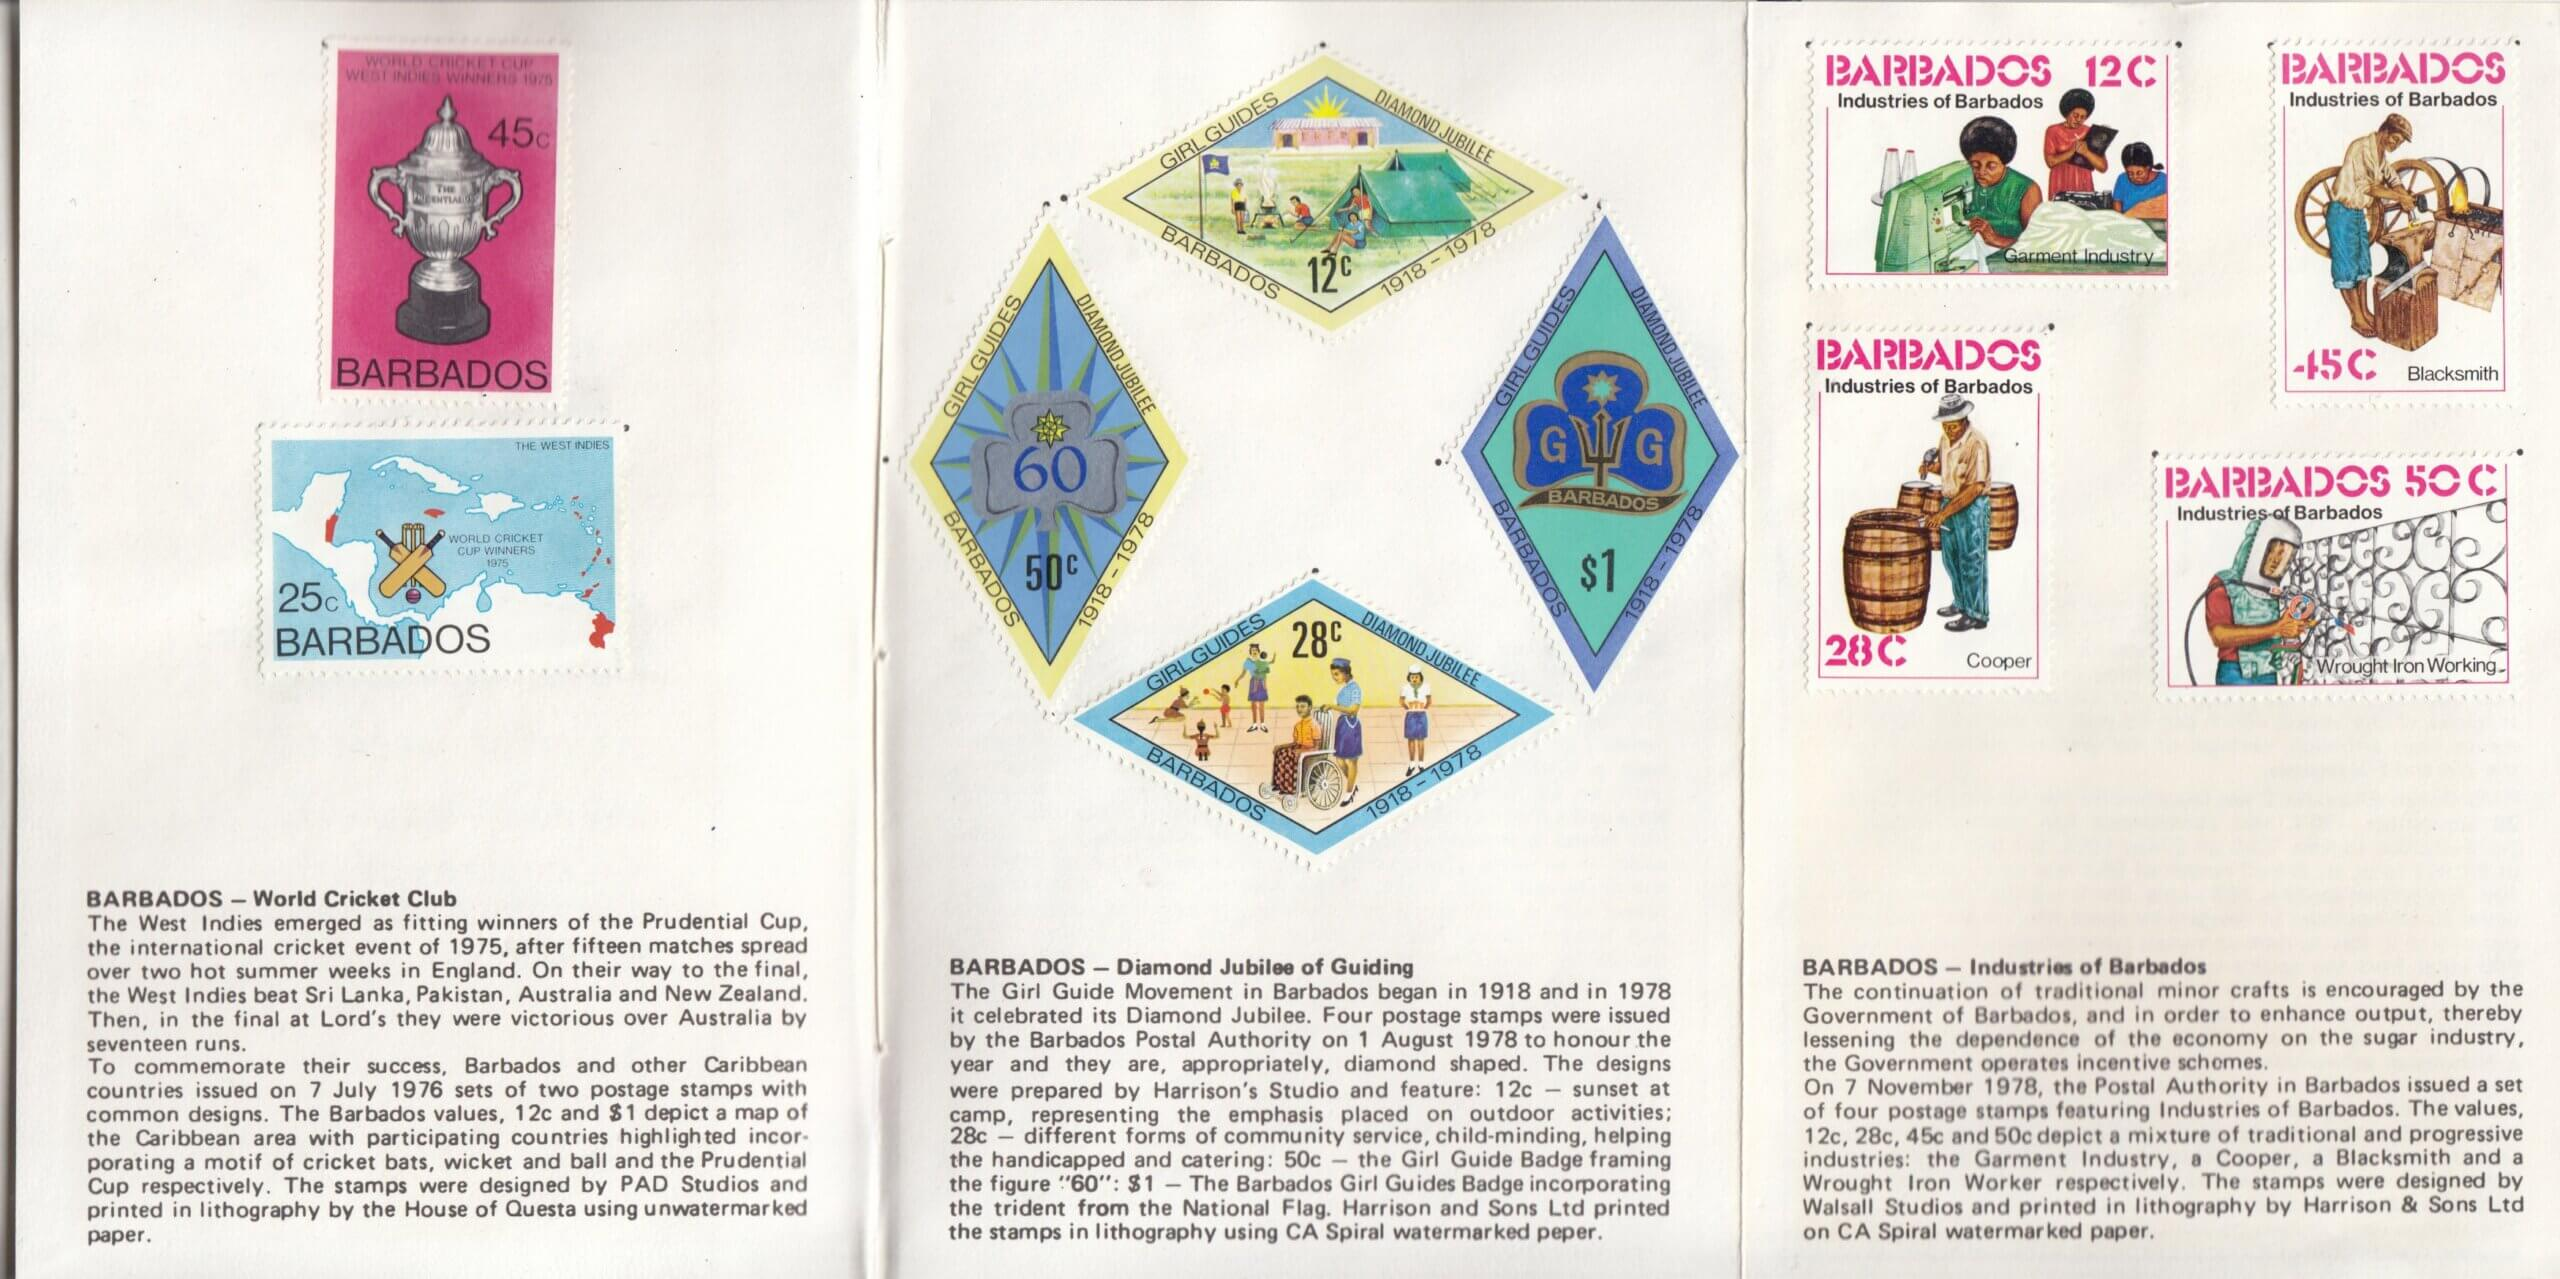 XVIIIth Congress of the Universal Postal Union, Rio de Janeiro 1979 - Barbados stamp booklet page 2